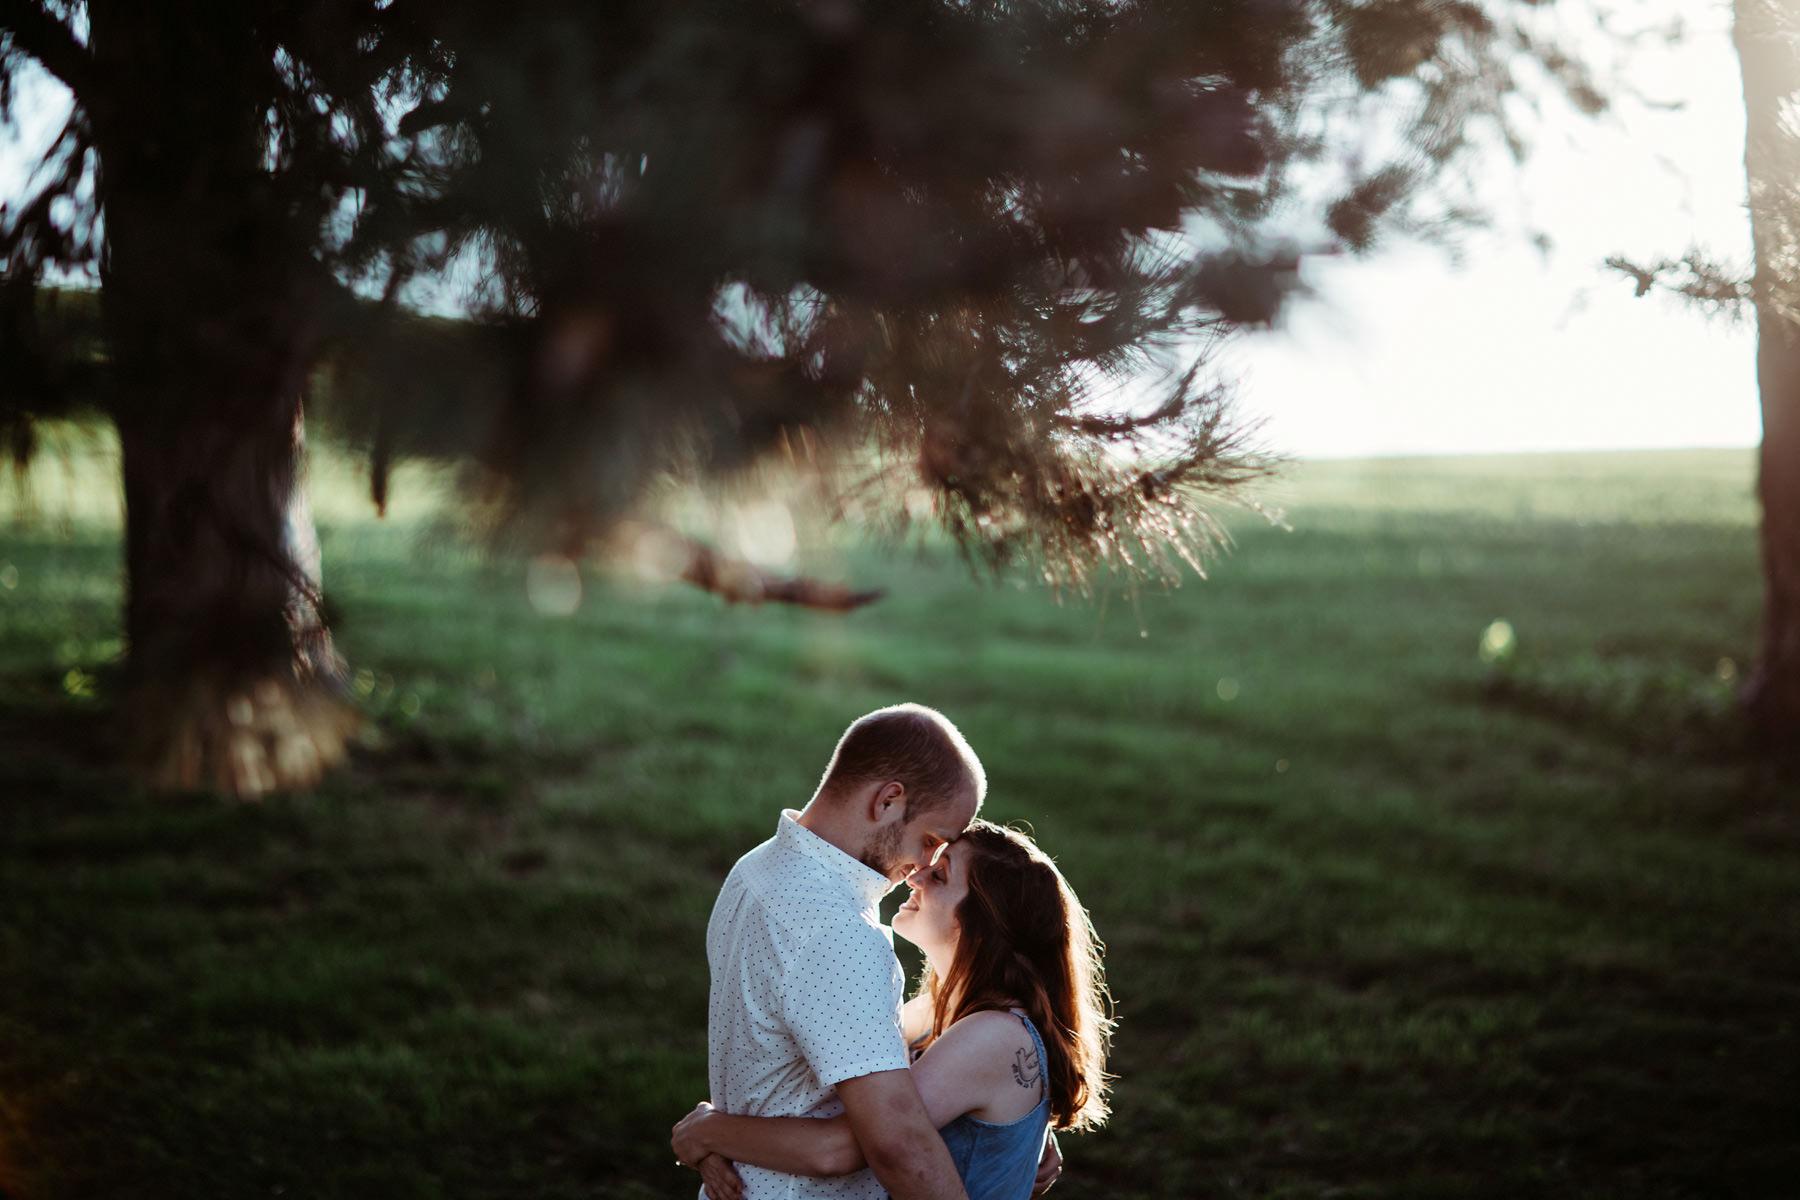 Kansas City_Penn Valley Park_Engagement Session_Kindling Wedding Photography06.JPG